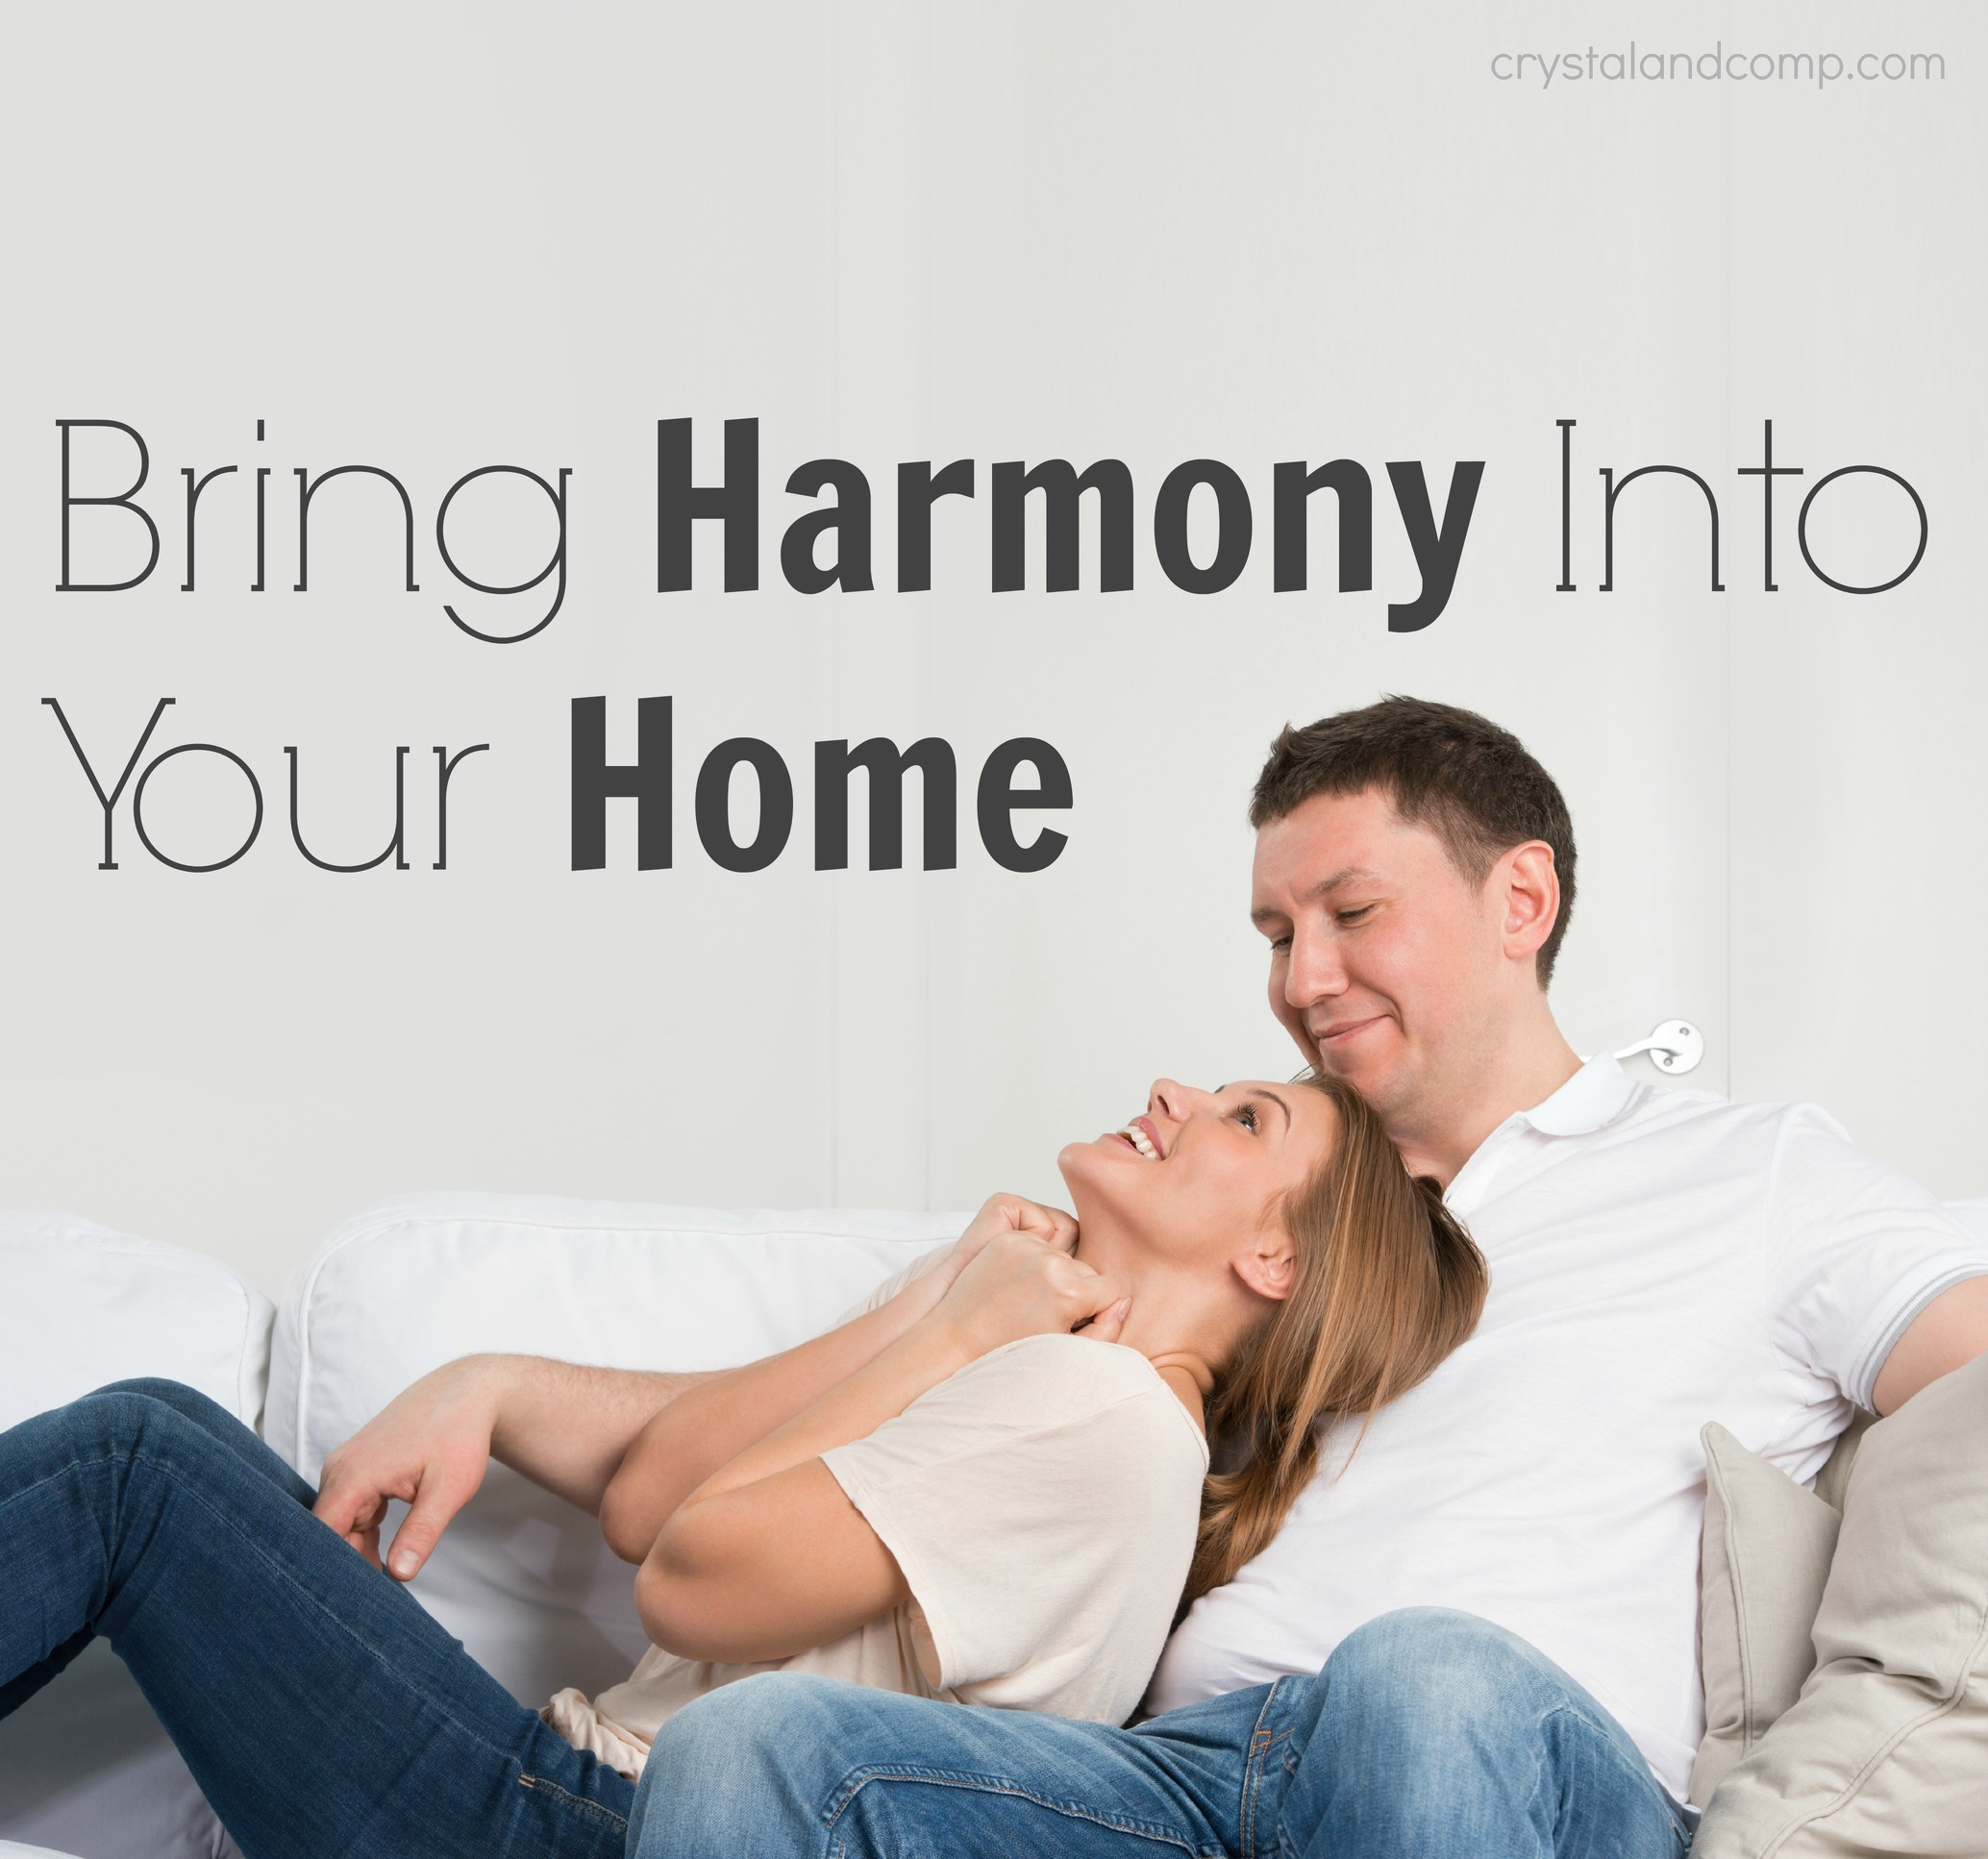 Bring Harmony Into Your Home Crystalandcomp Com